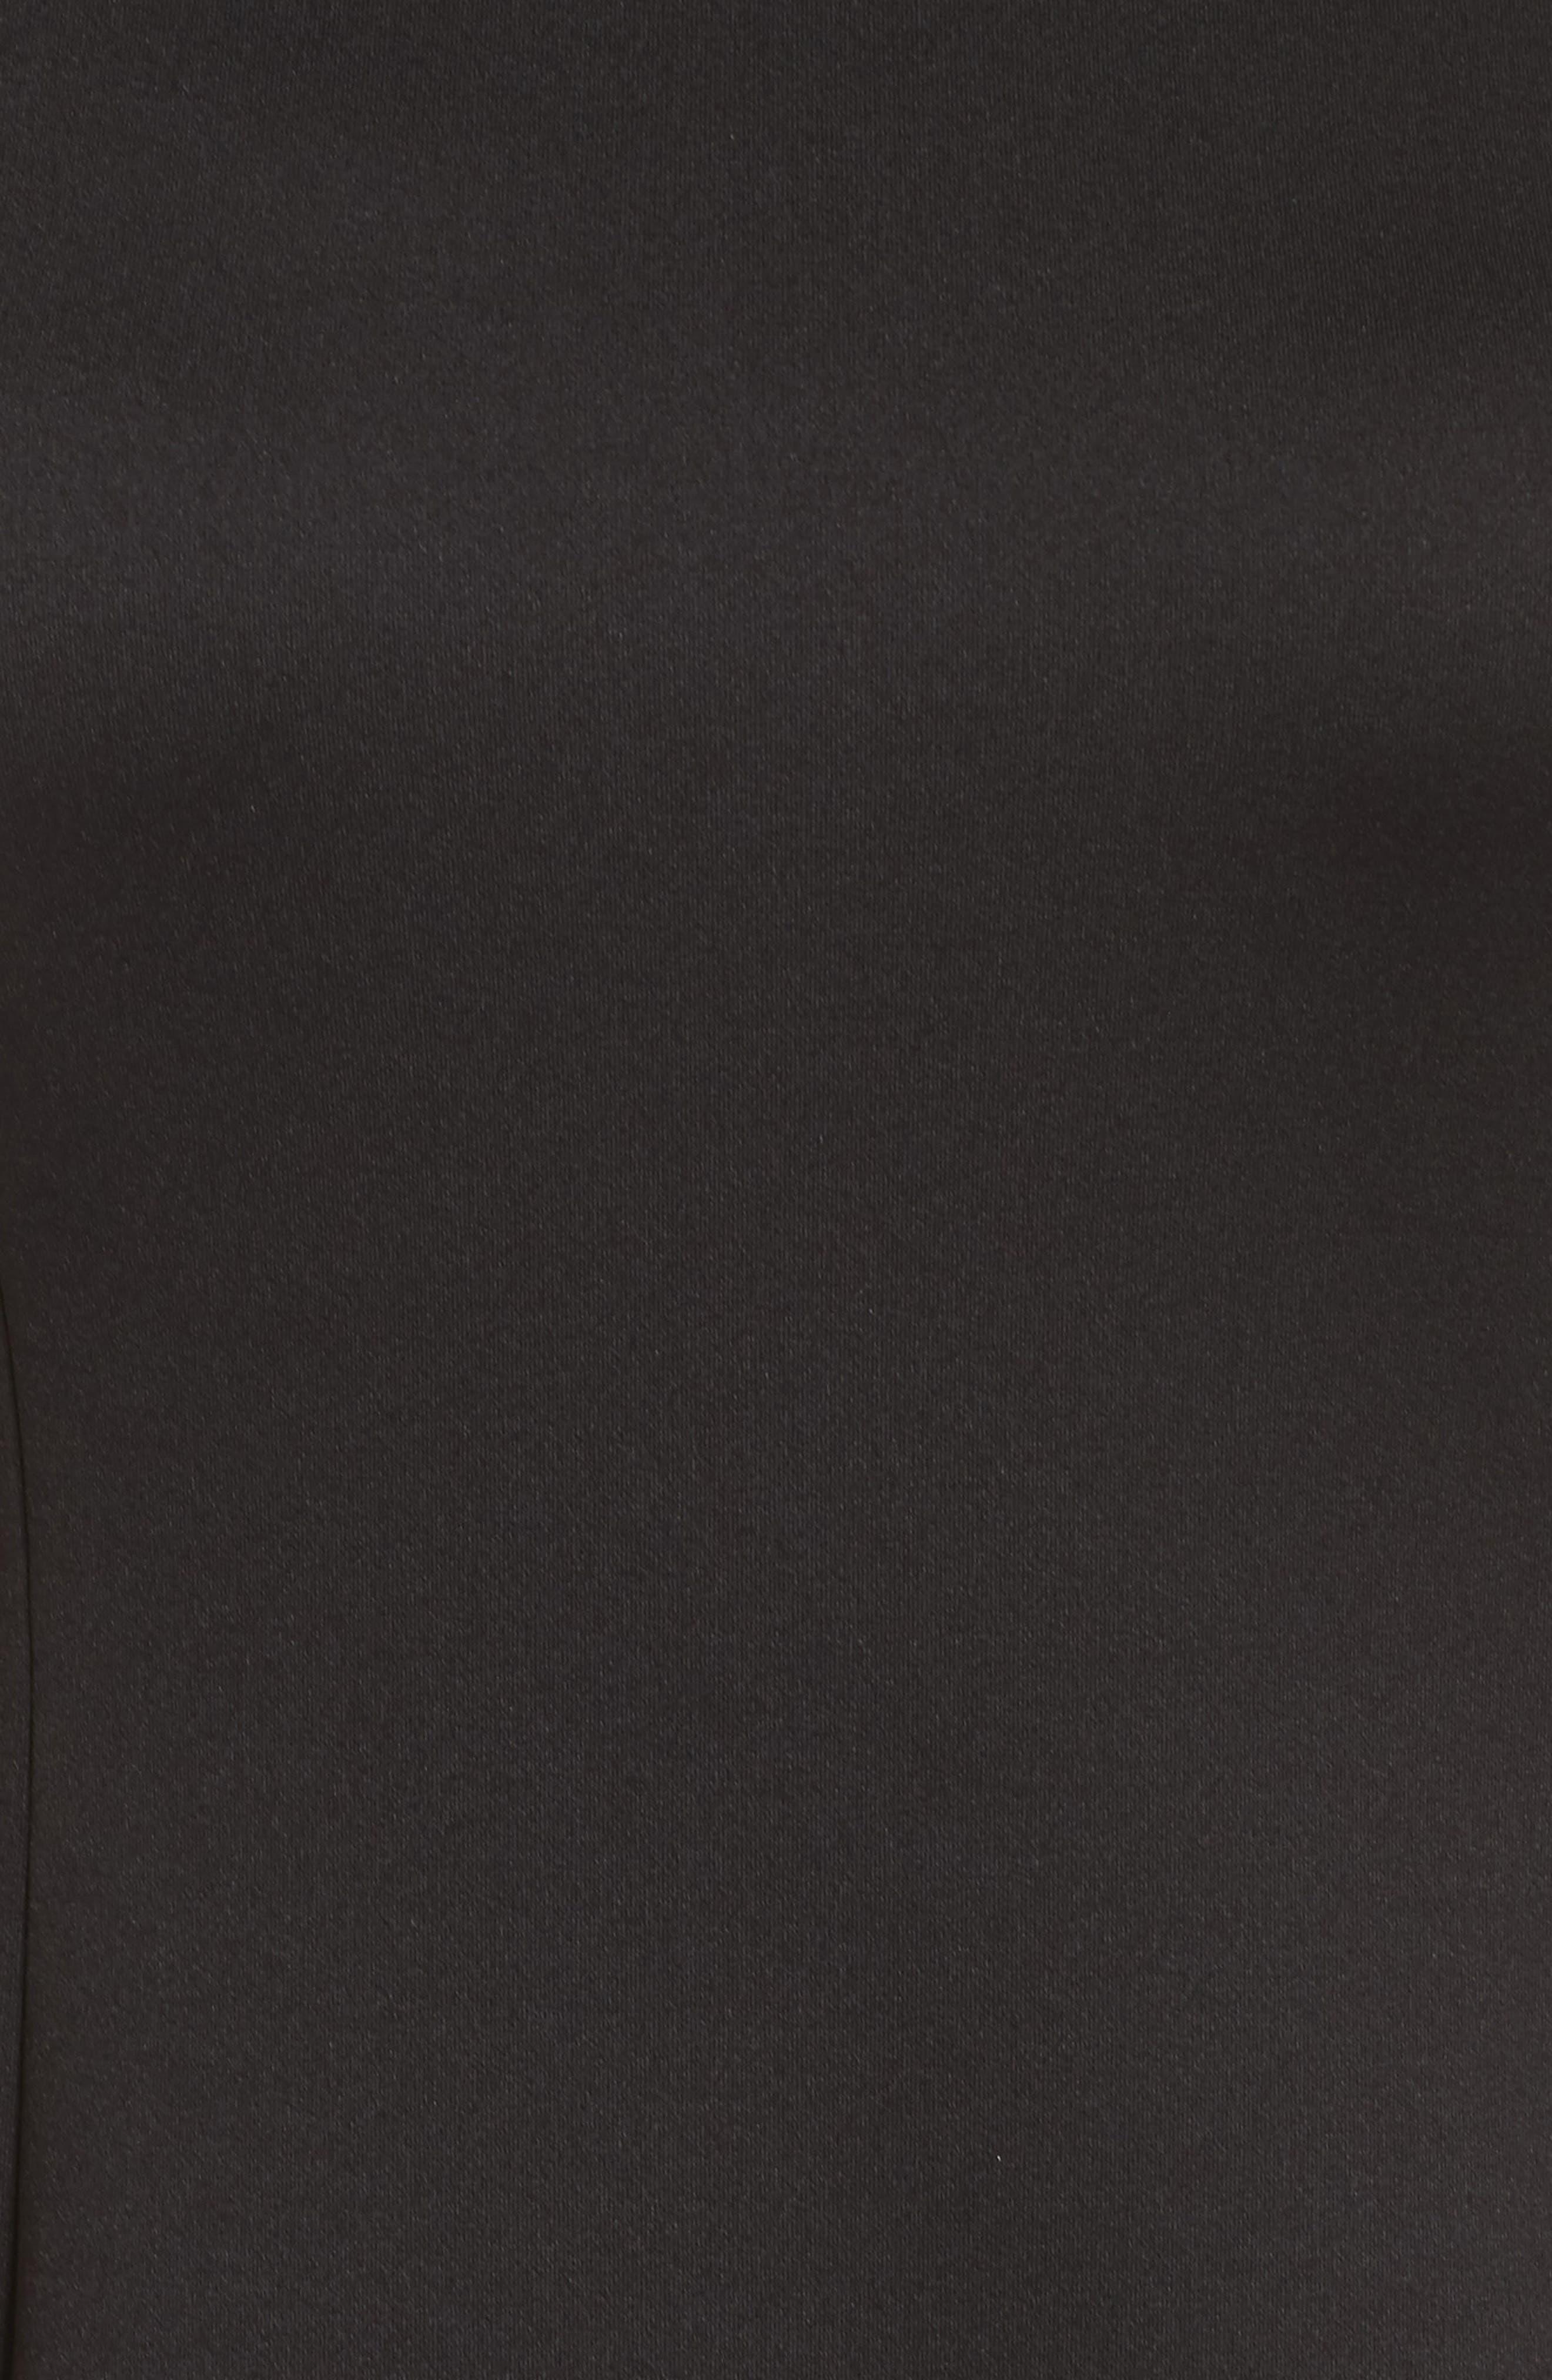 Midi Bell Dress,                             Alternate thumbnail 5, color,                             Black